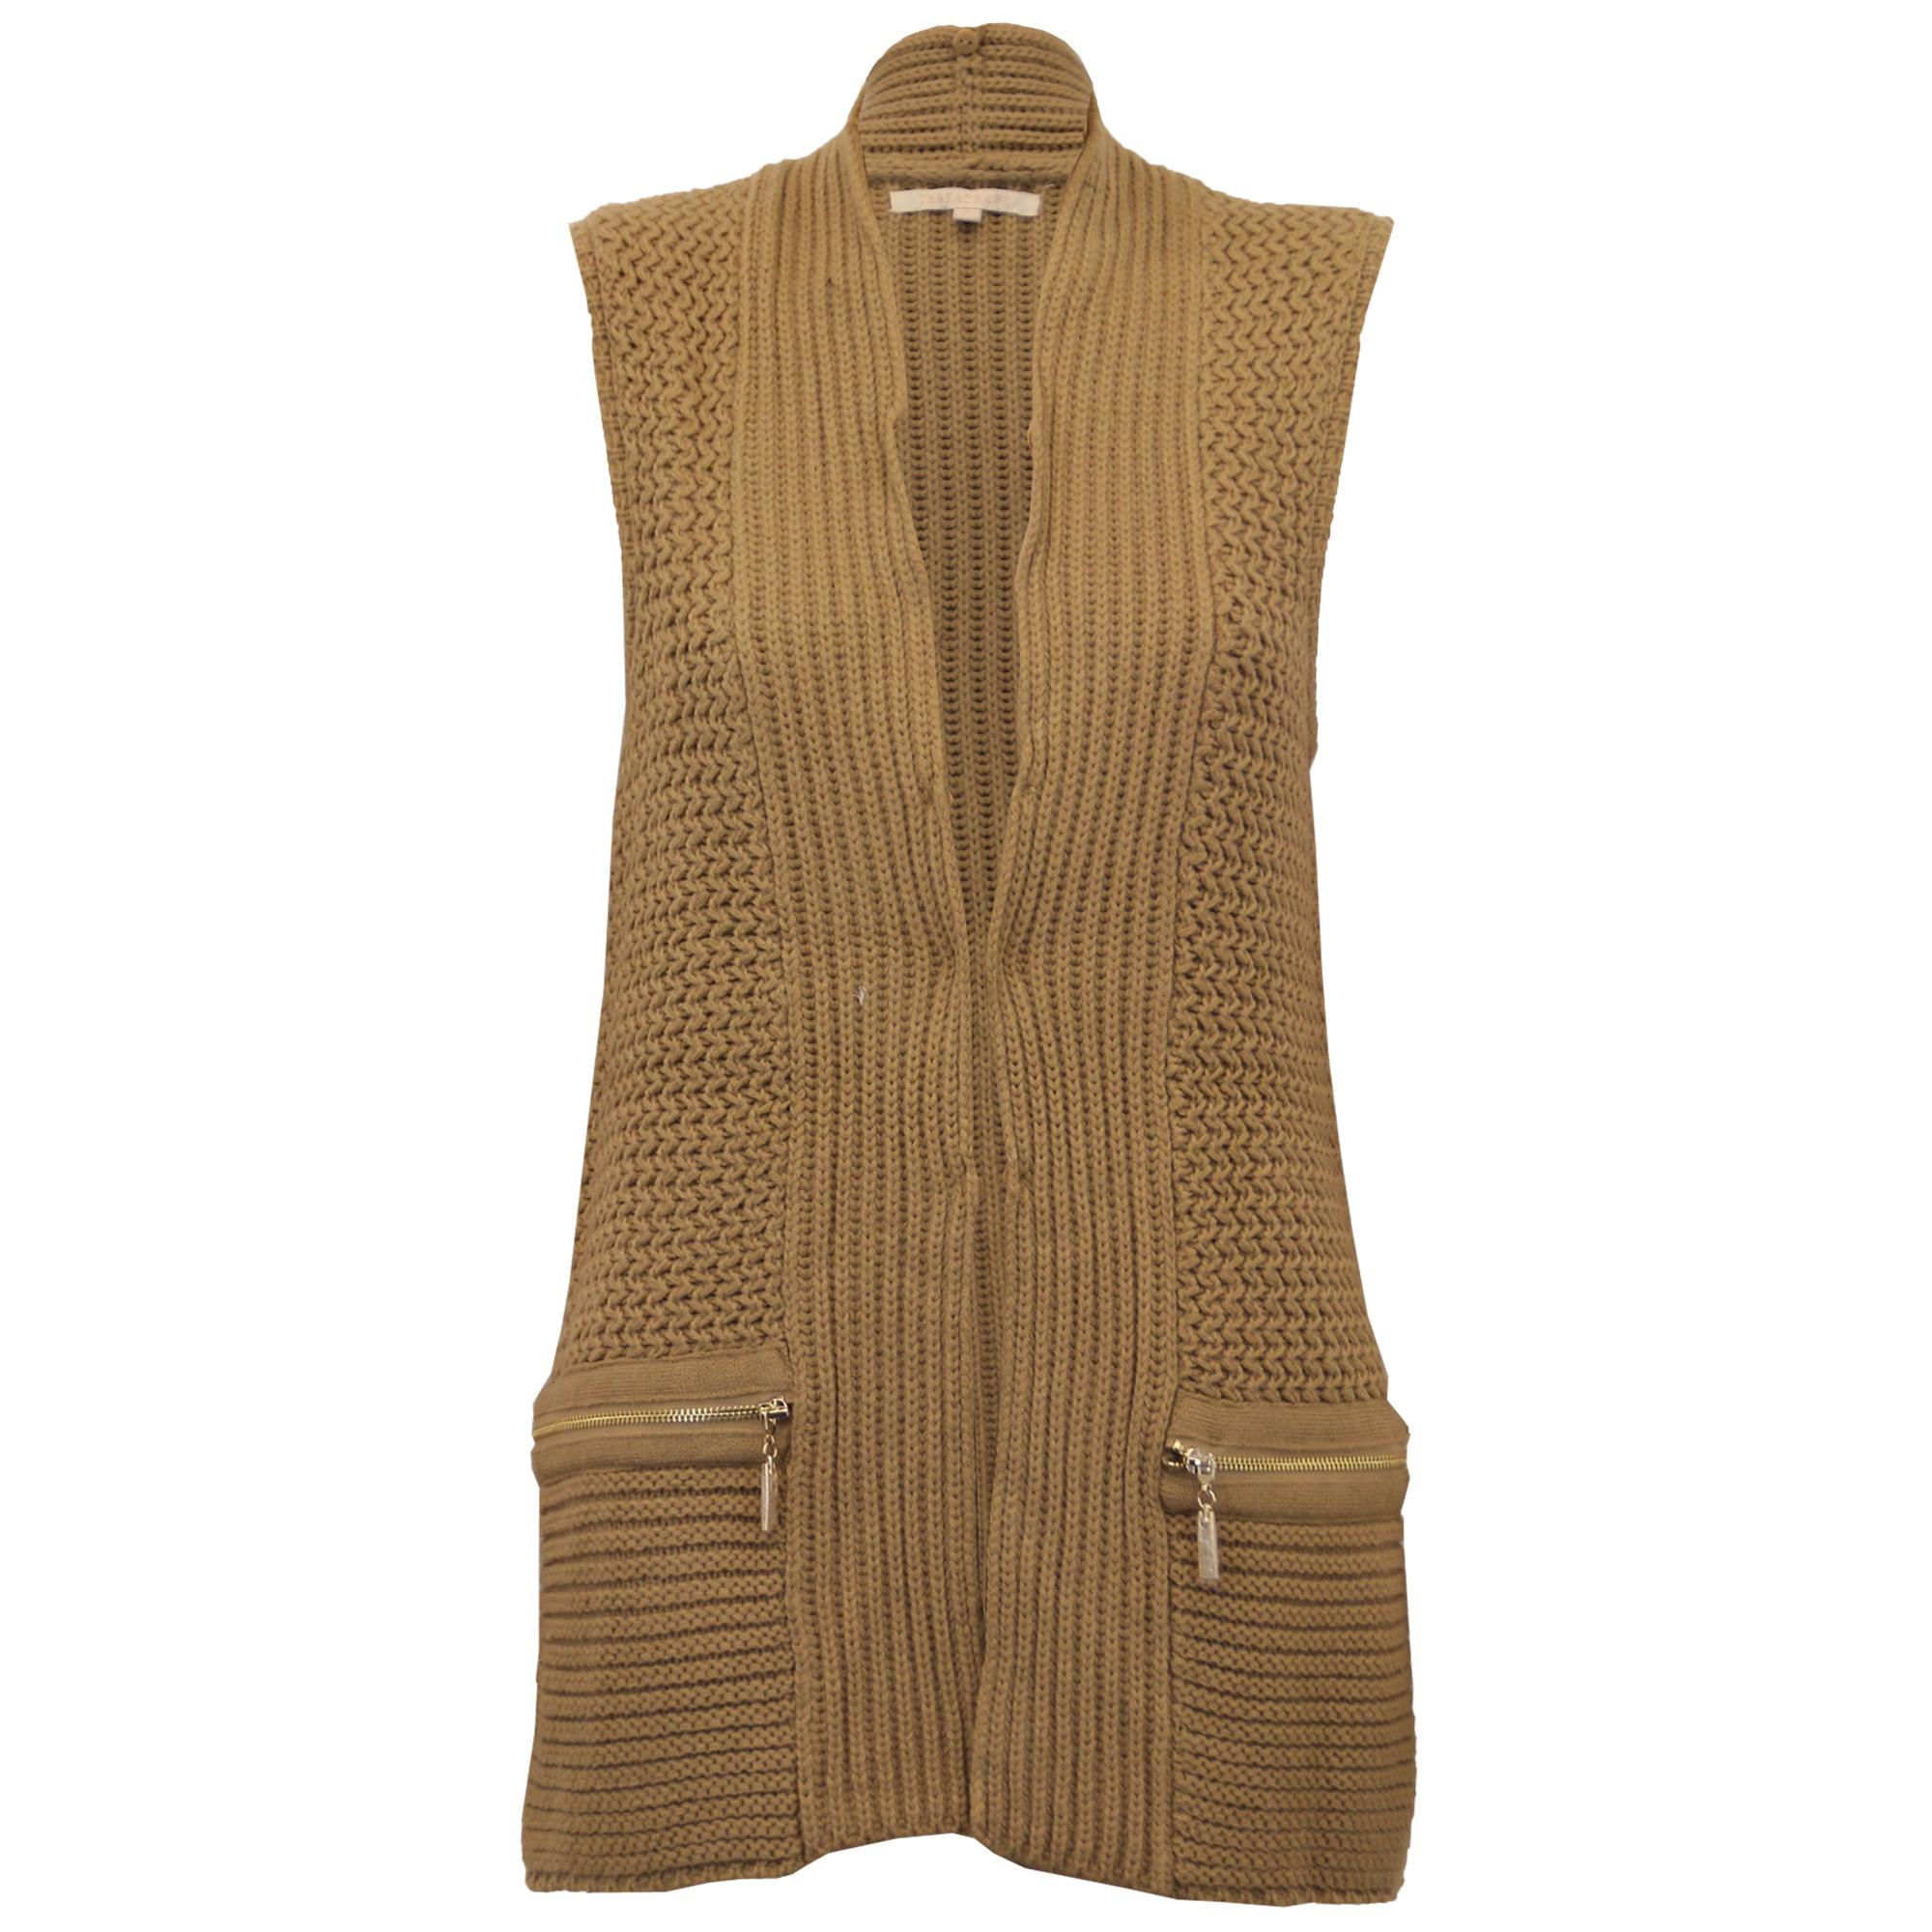 Ladies Gilet Threadbare Womens Knitted Bodywarmer Open Front Fur ...